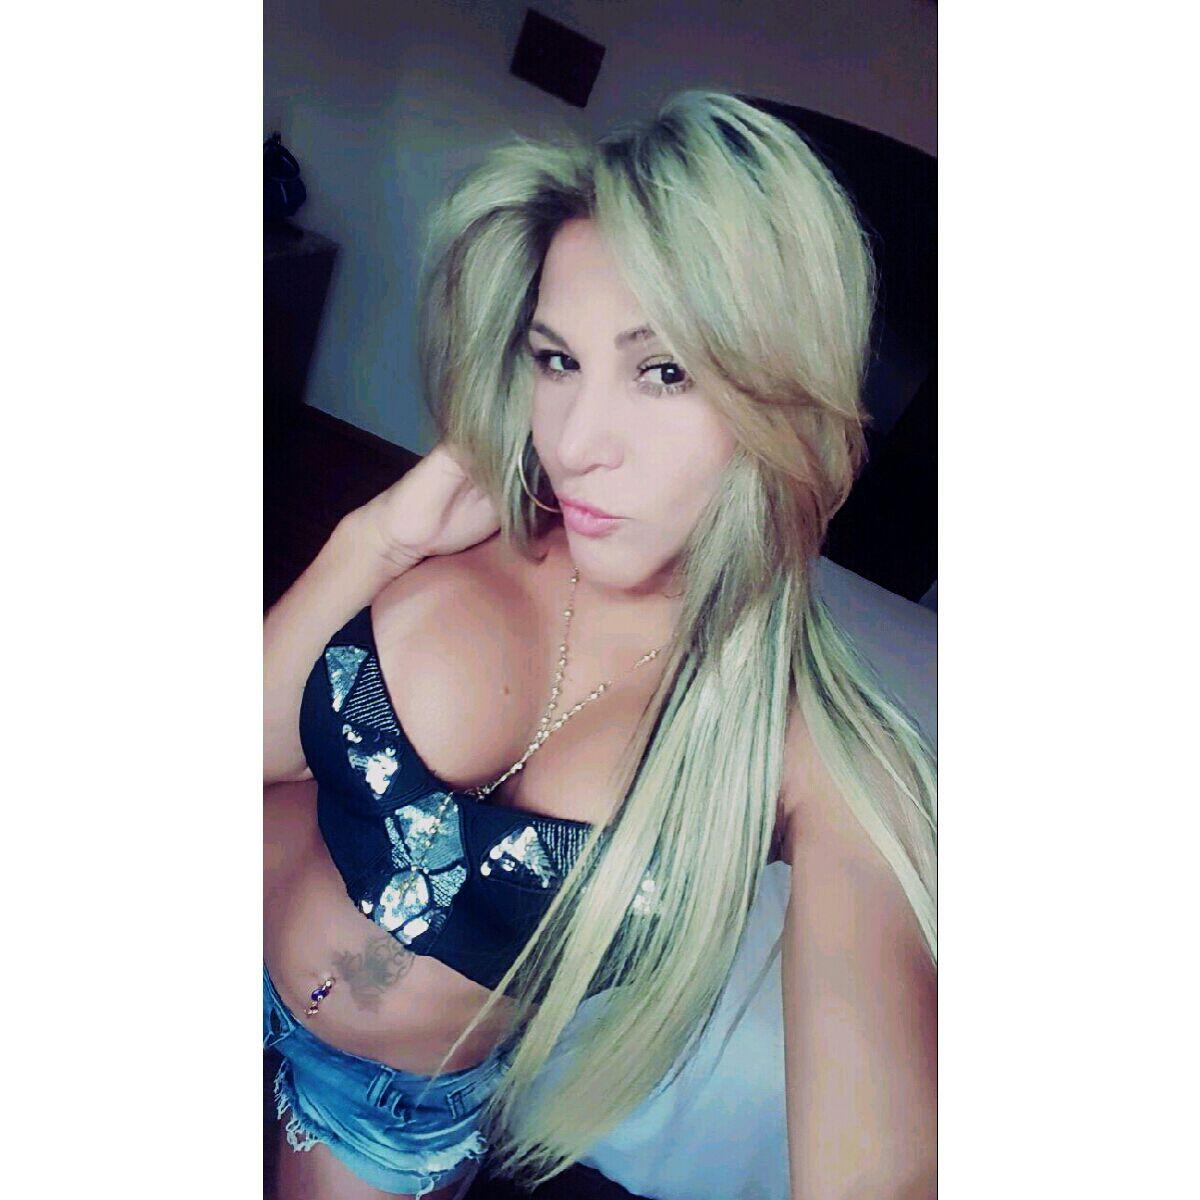 M U J E R E S !!.. De vuelta a Venezuela! xD - Página 34 Ed197a642653283